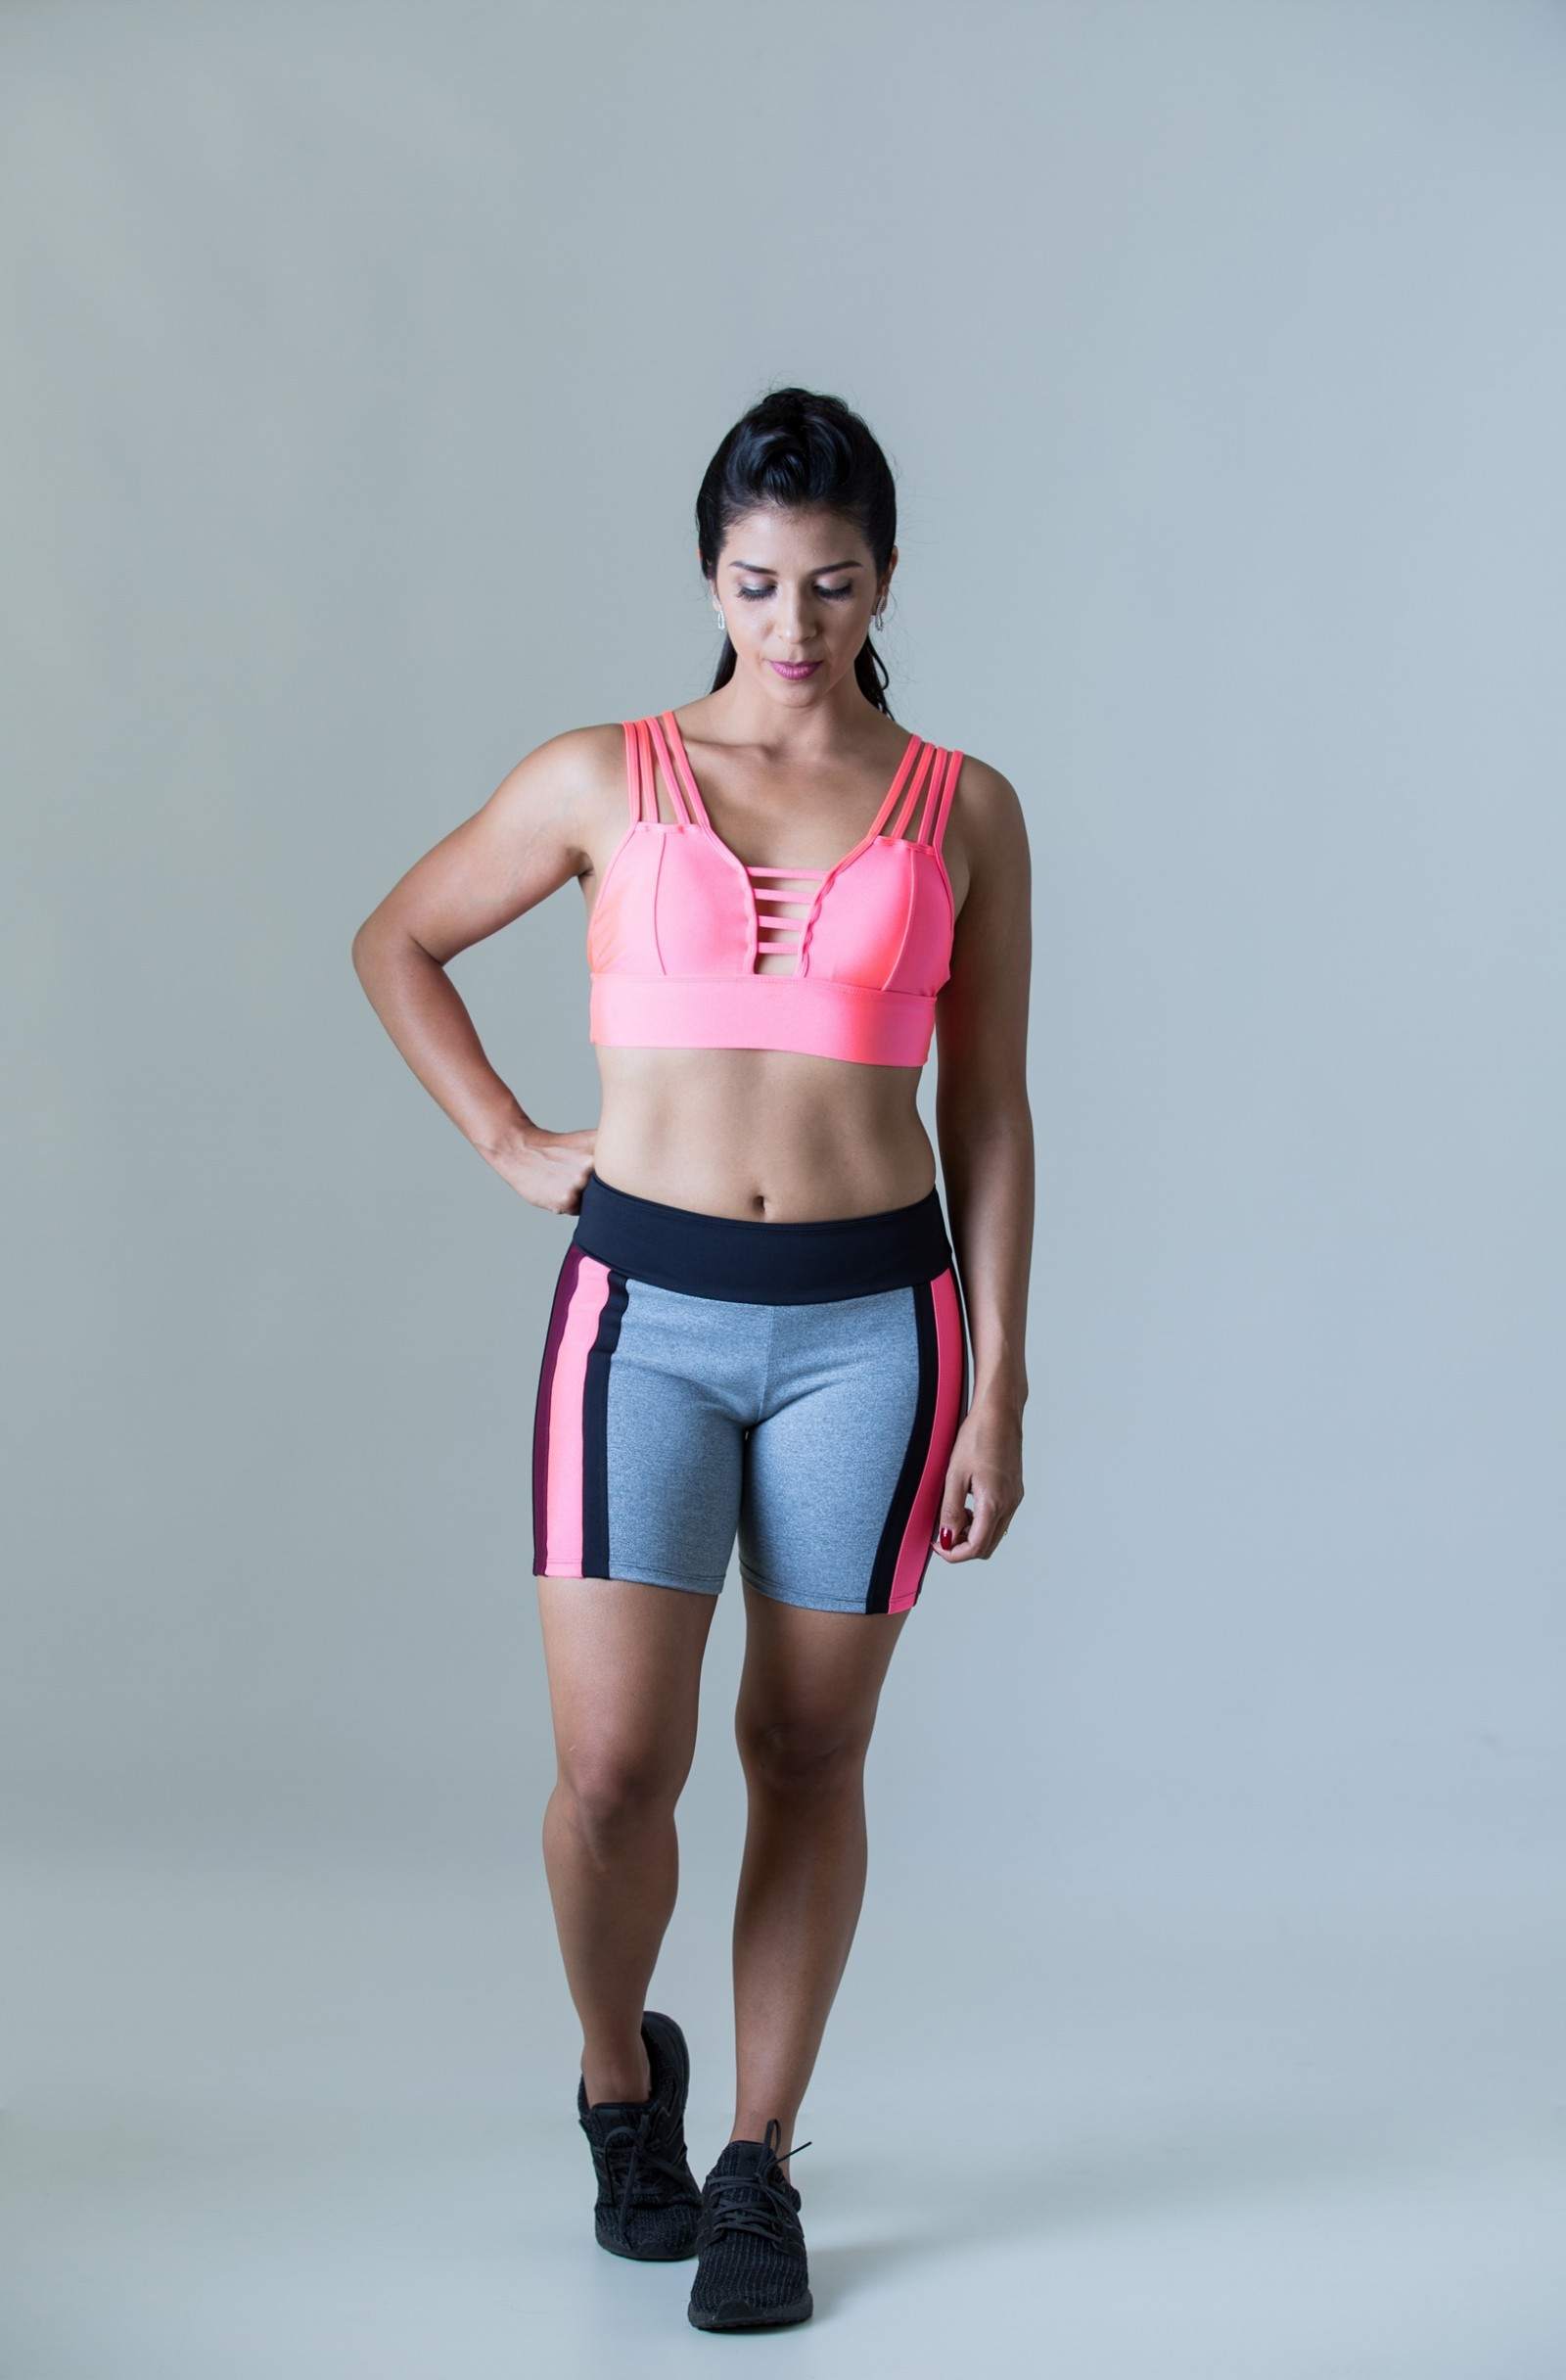 Bermuda Mellowness Glow, Coleção Plenitude - NKT Fitwear Moda Fitness